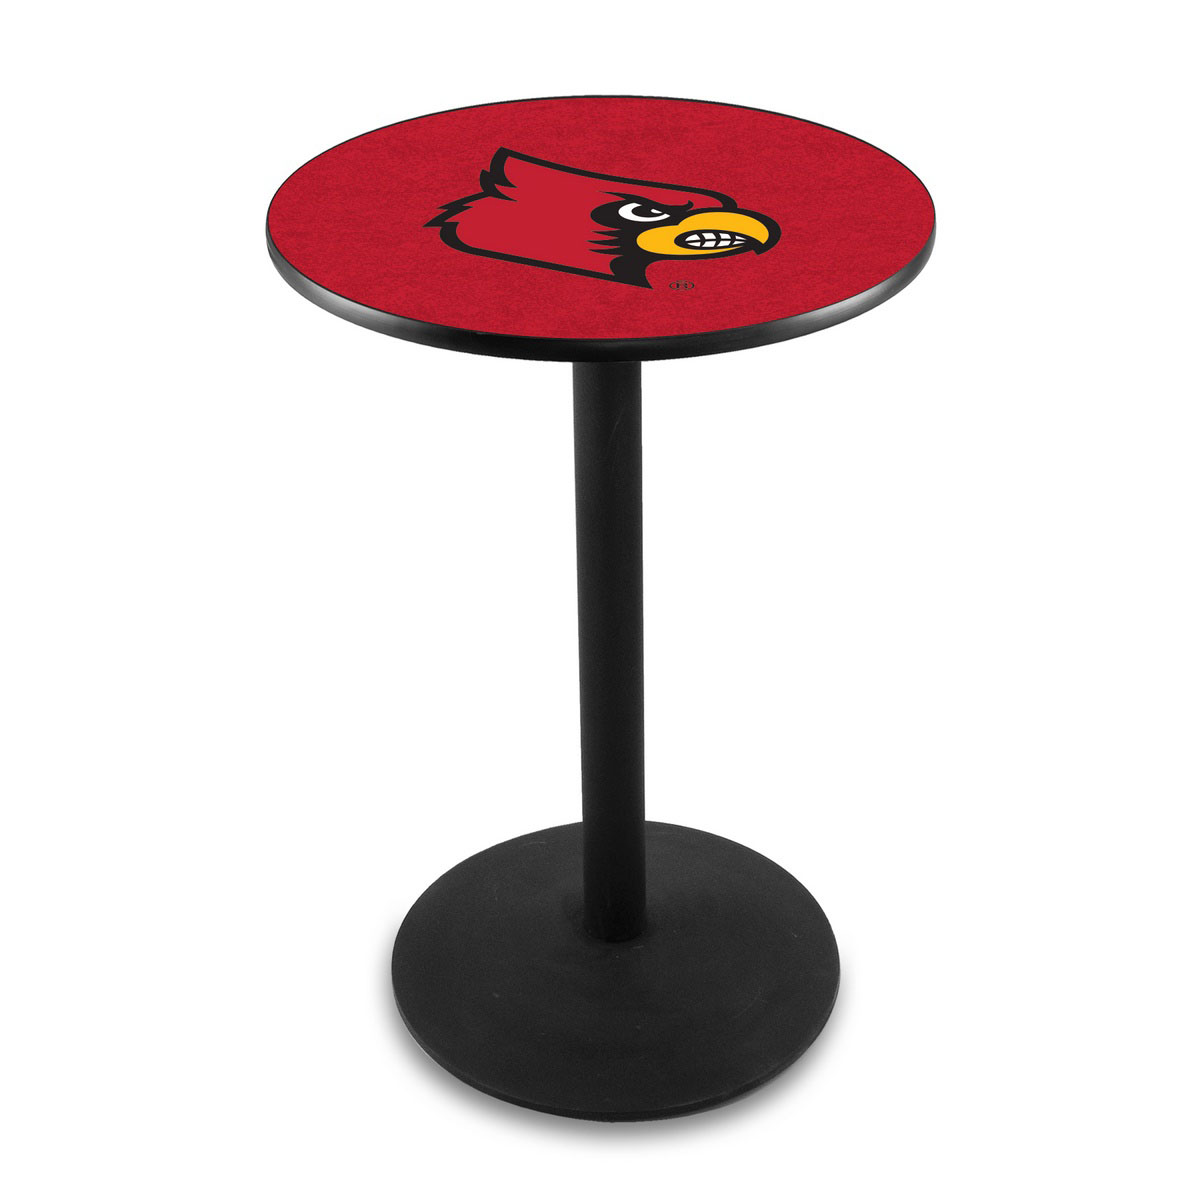 Design University Louisville Logo Pub Bar Table Round Stand Product Photo